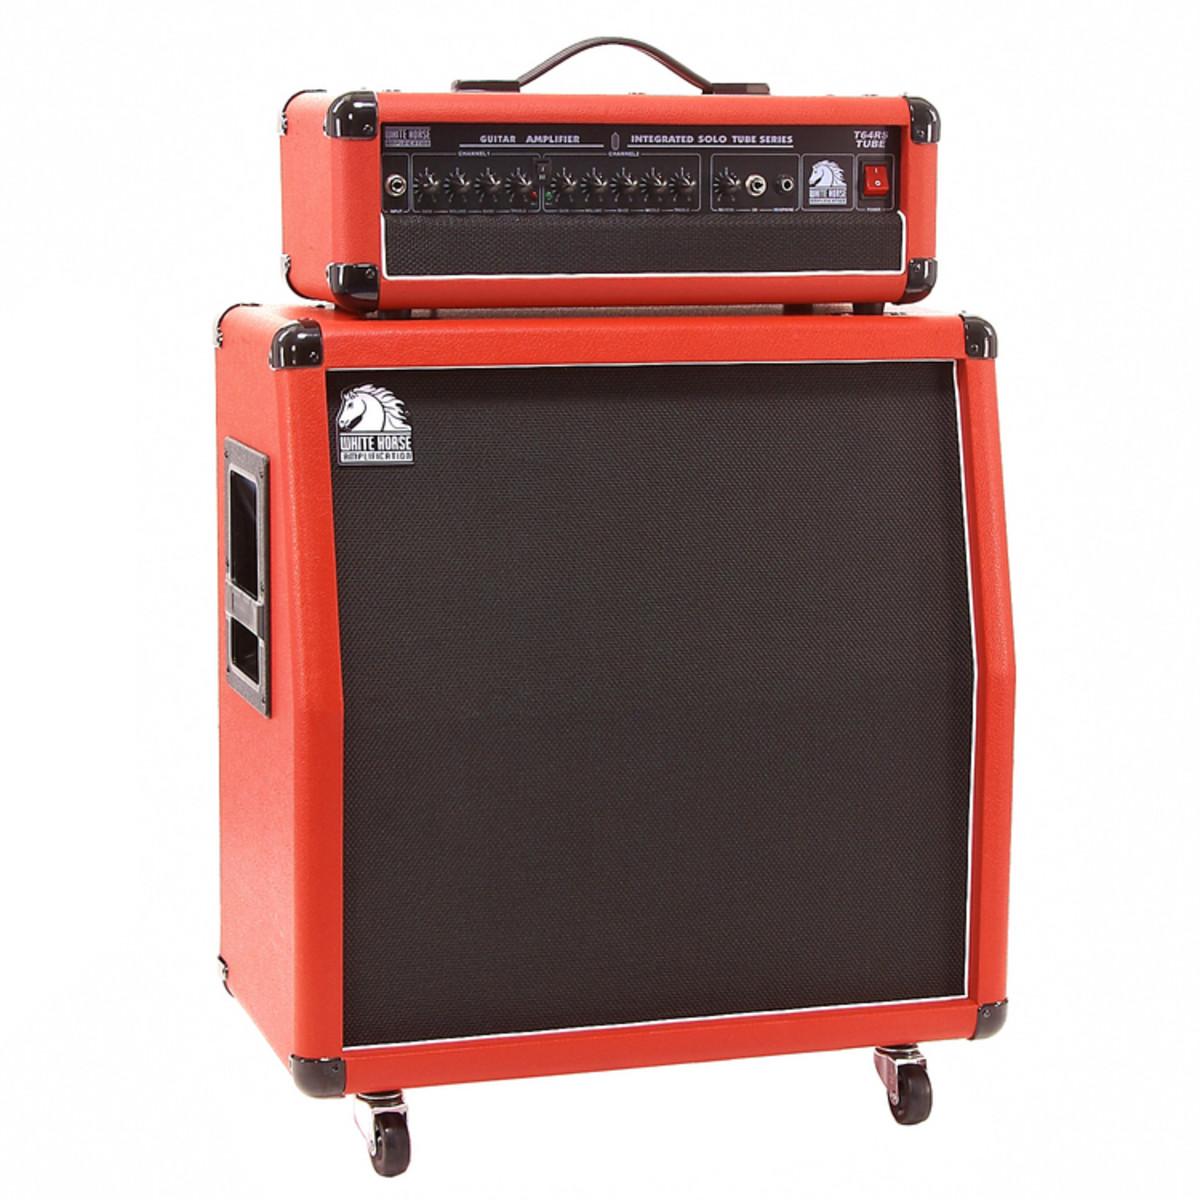 Metal Guitar Amps : metal x guitar white horse 60w tube guitar amp with 4x8 cab red at ~ Hamham.info Haus und Dekorationen